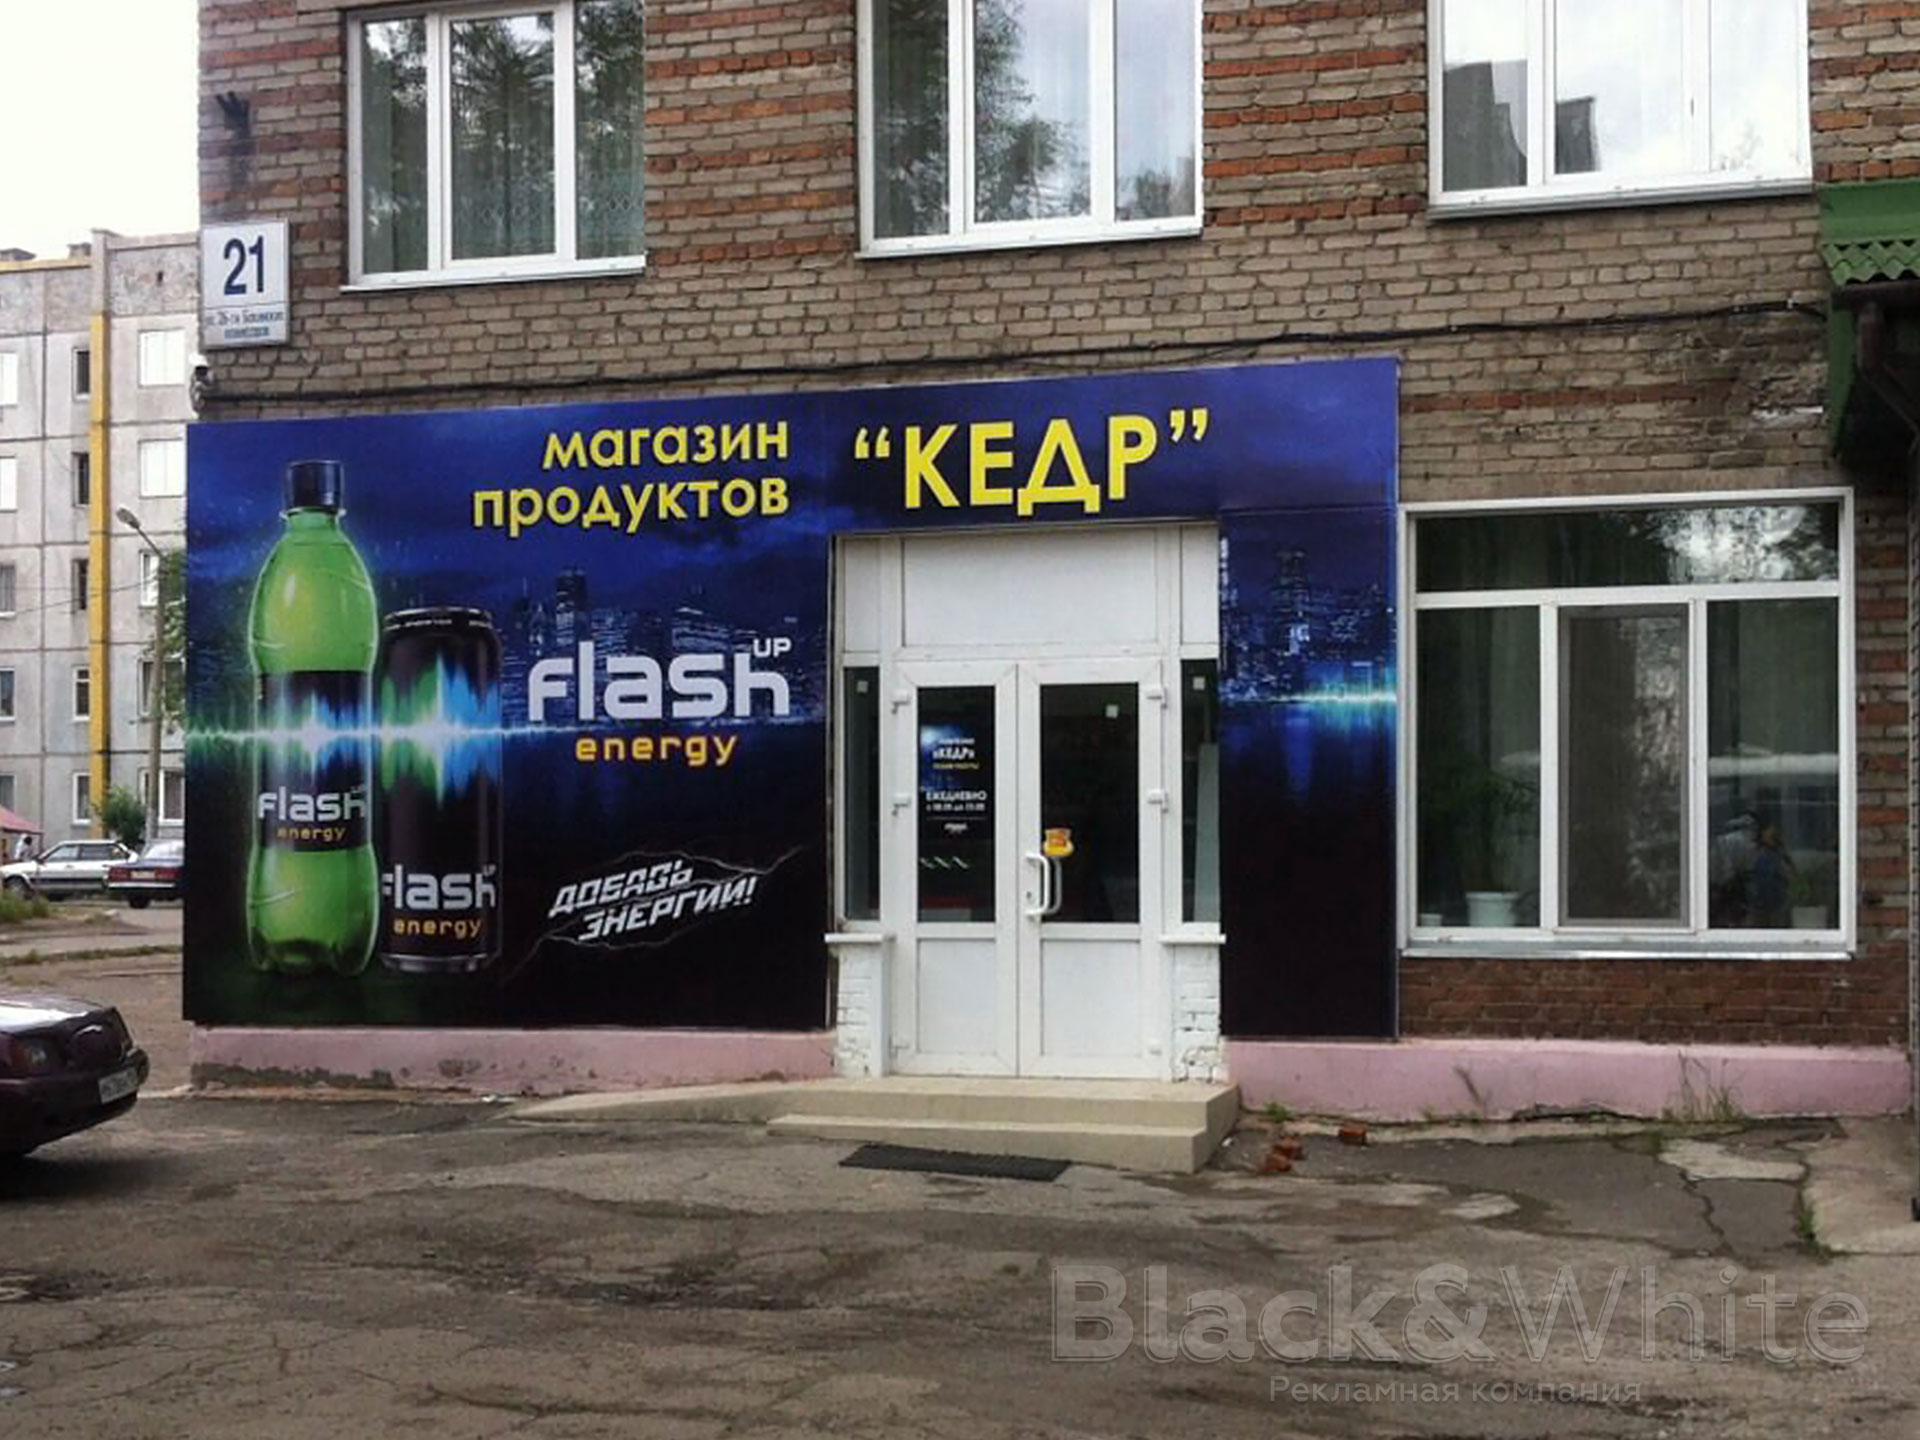 Печать-на-баннере-металлокаркас-в-Красноярске-Black&White.jpg